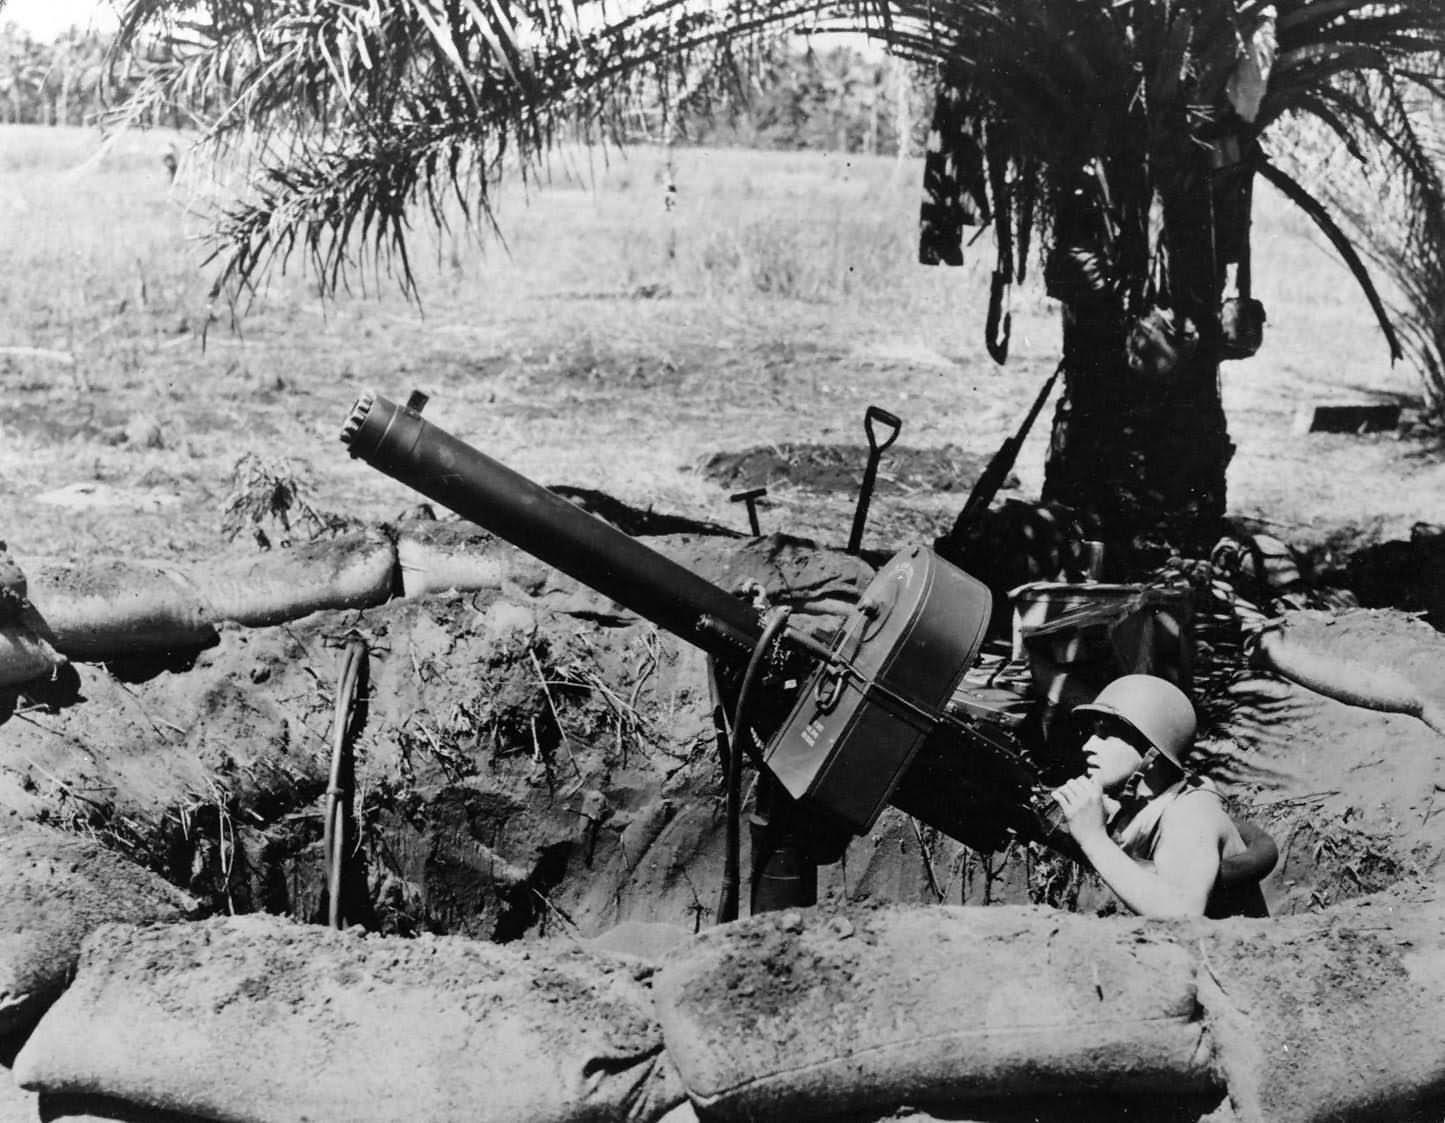 Marine at Browning .50-cal (12,7 mm), water-cooled antiaircraft machine gun – Guadalcanal 1942